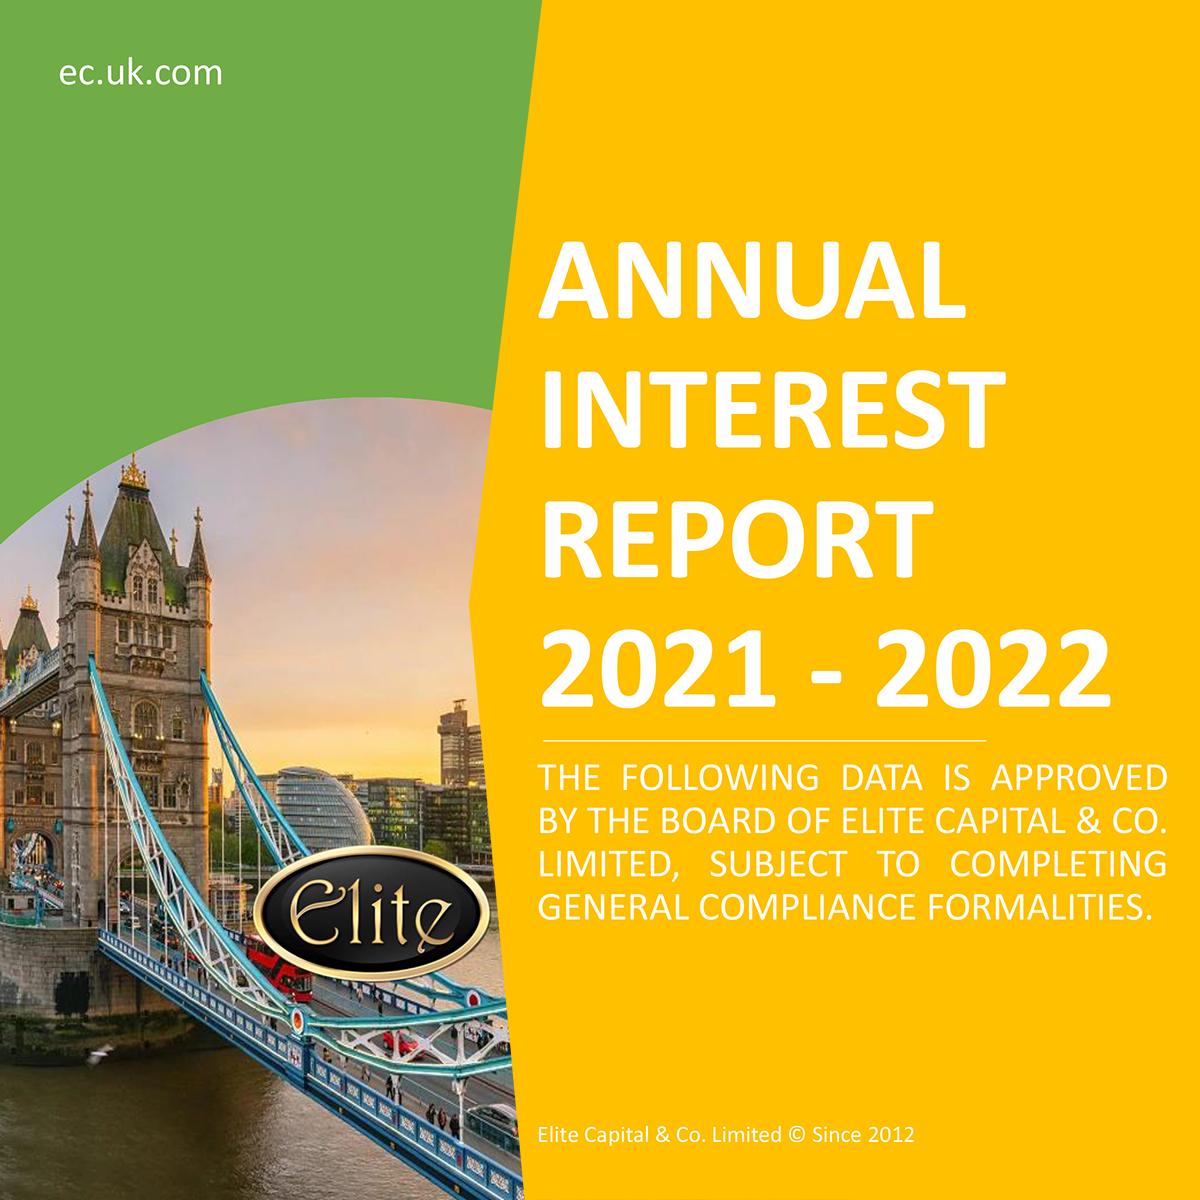 Elite Capital & Co.'s Annual Interest Report 2021 – 2022